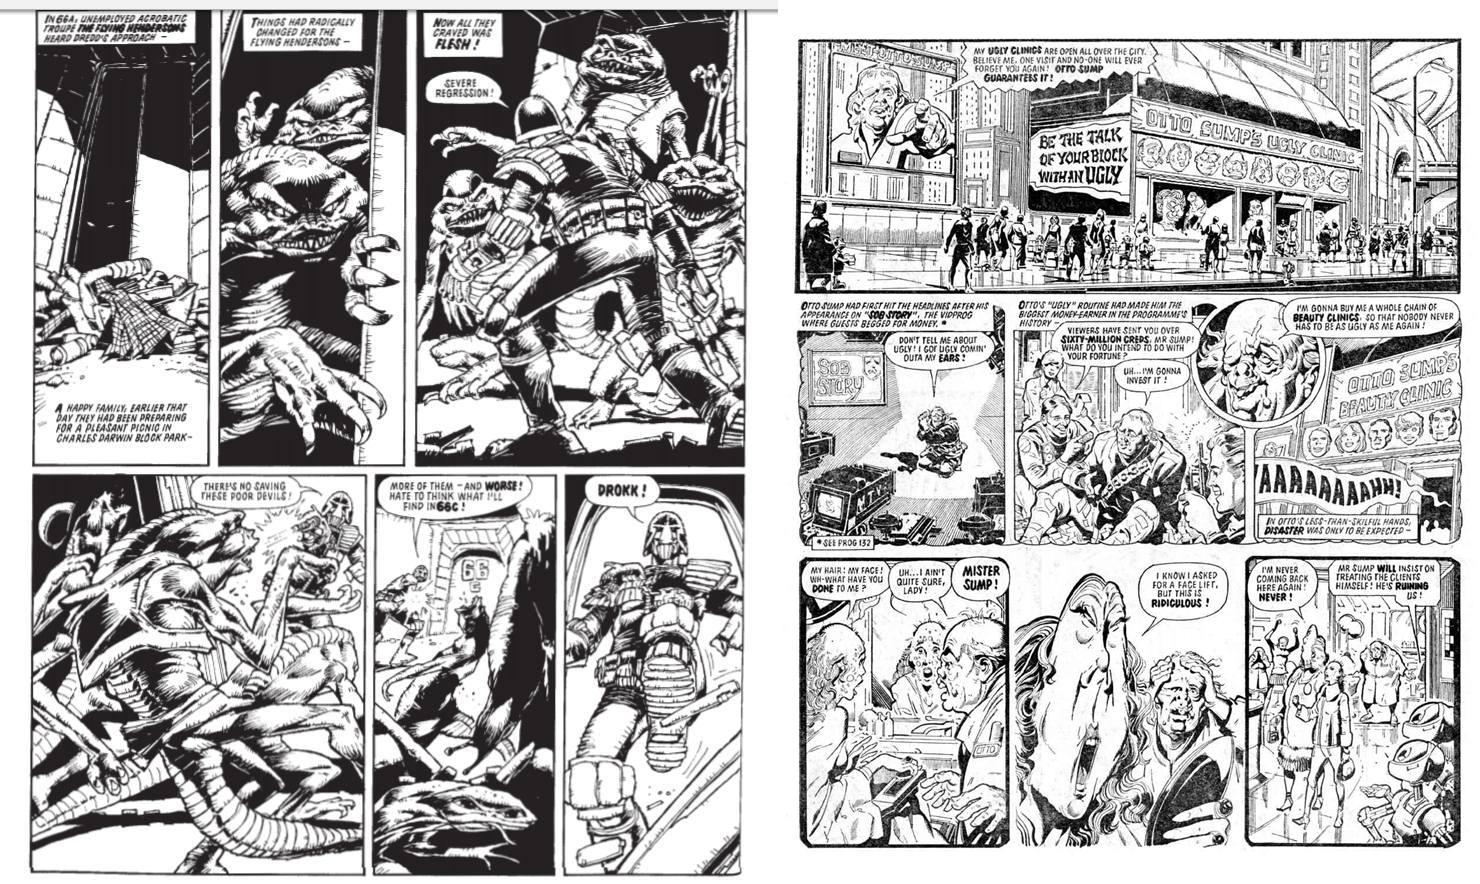 Judge Dredd Complete Case Files 04 review